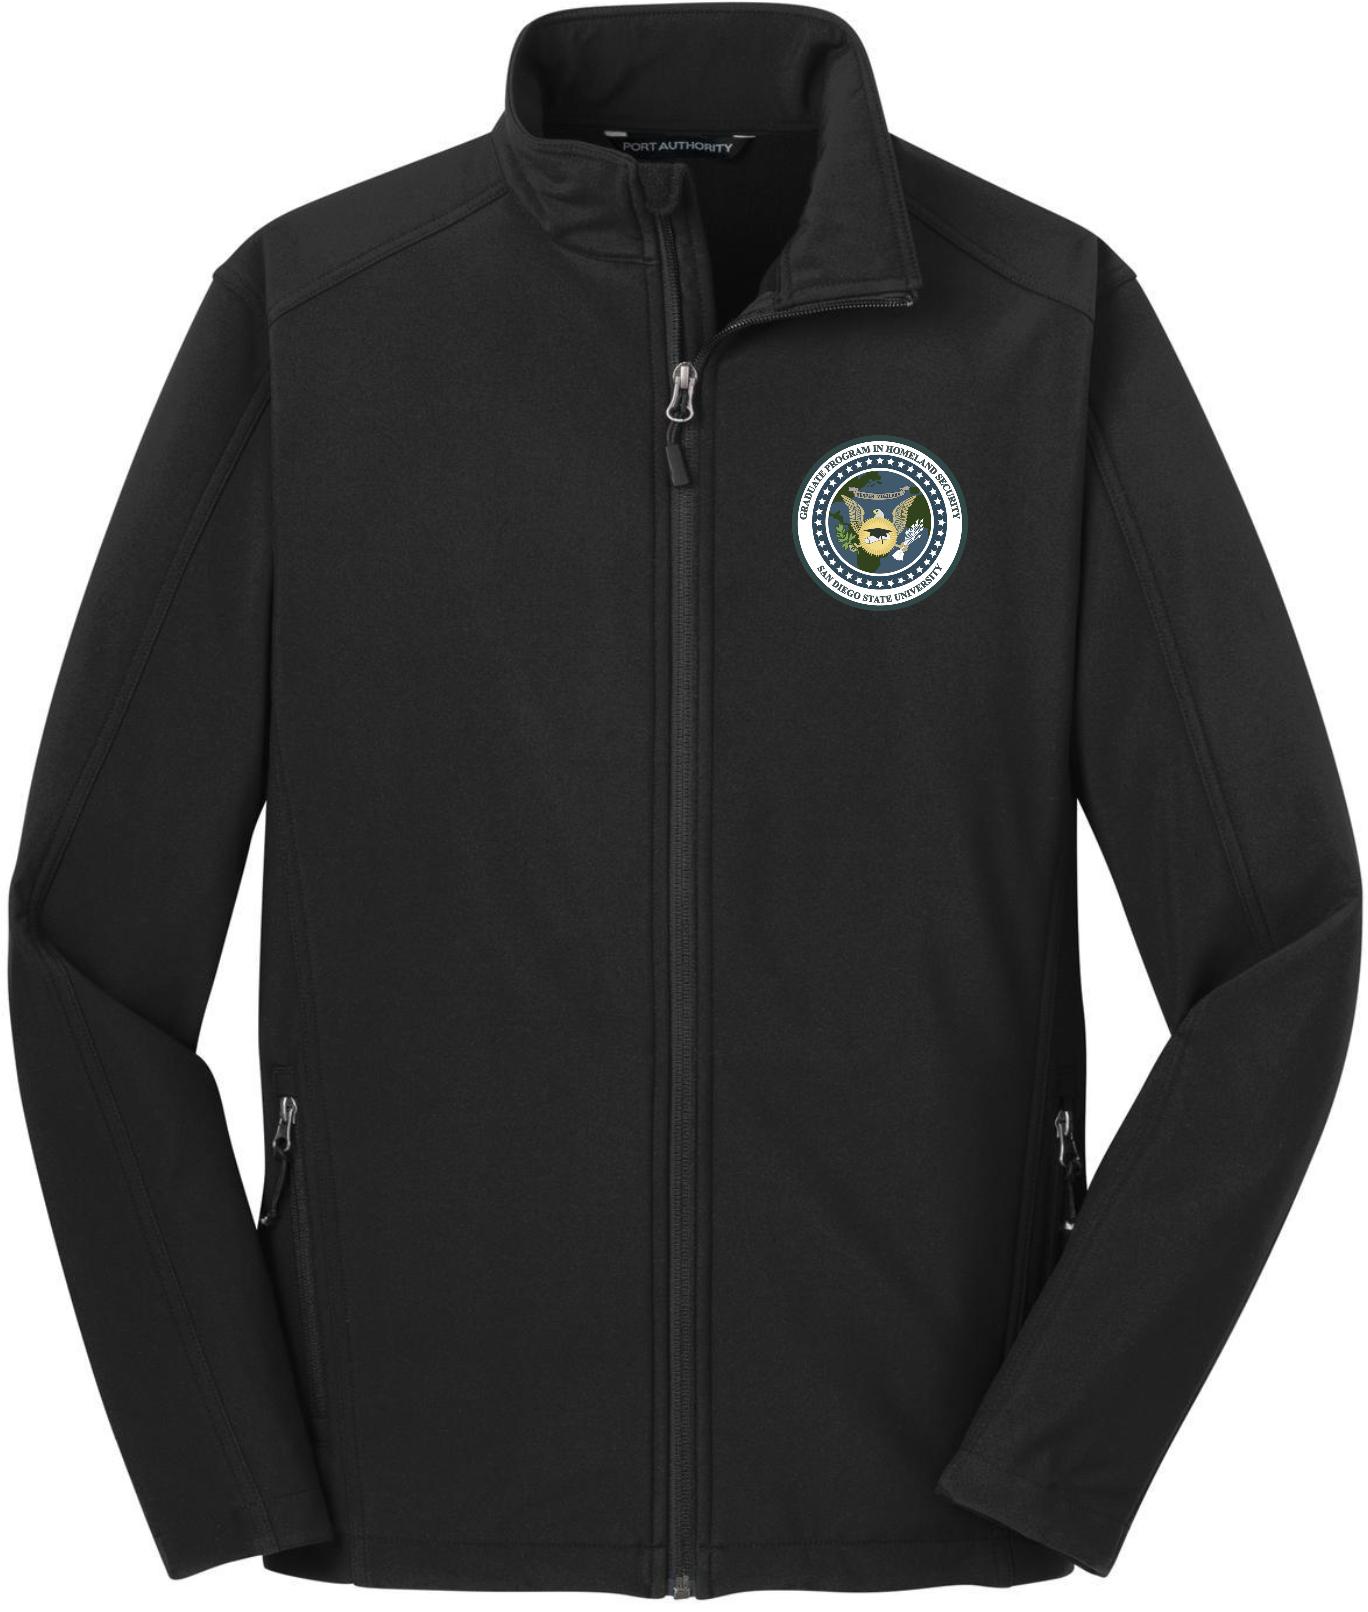 SDSU HSEC Unisex Jacket